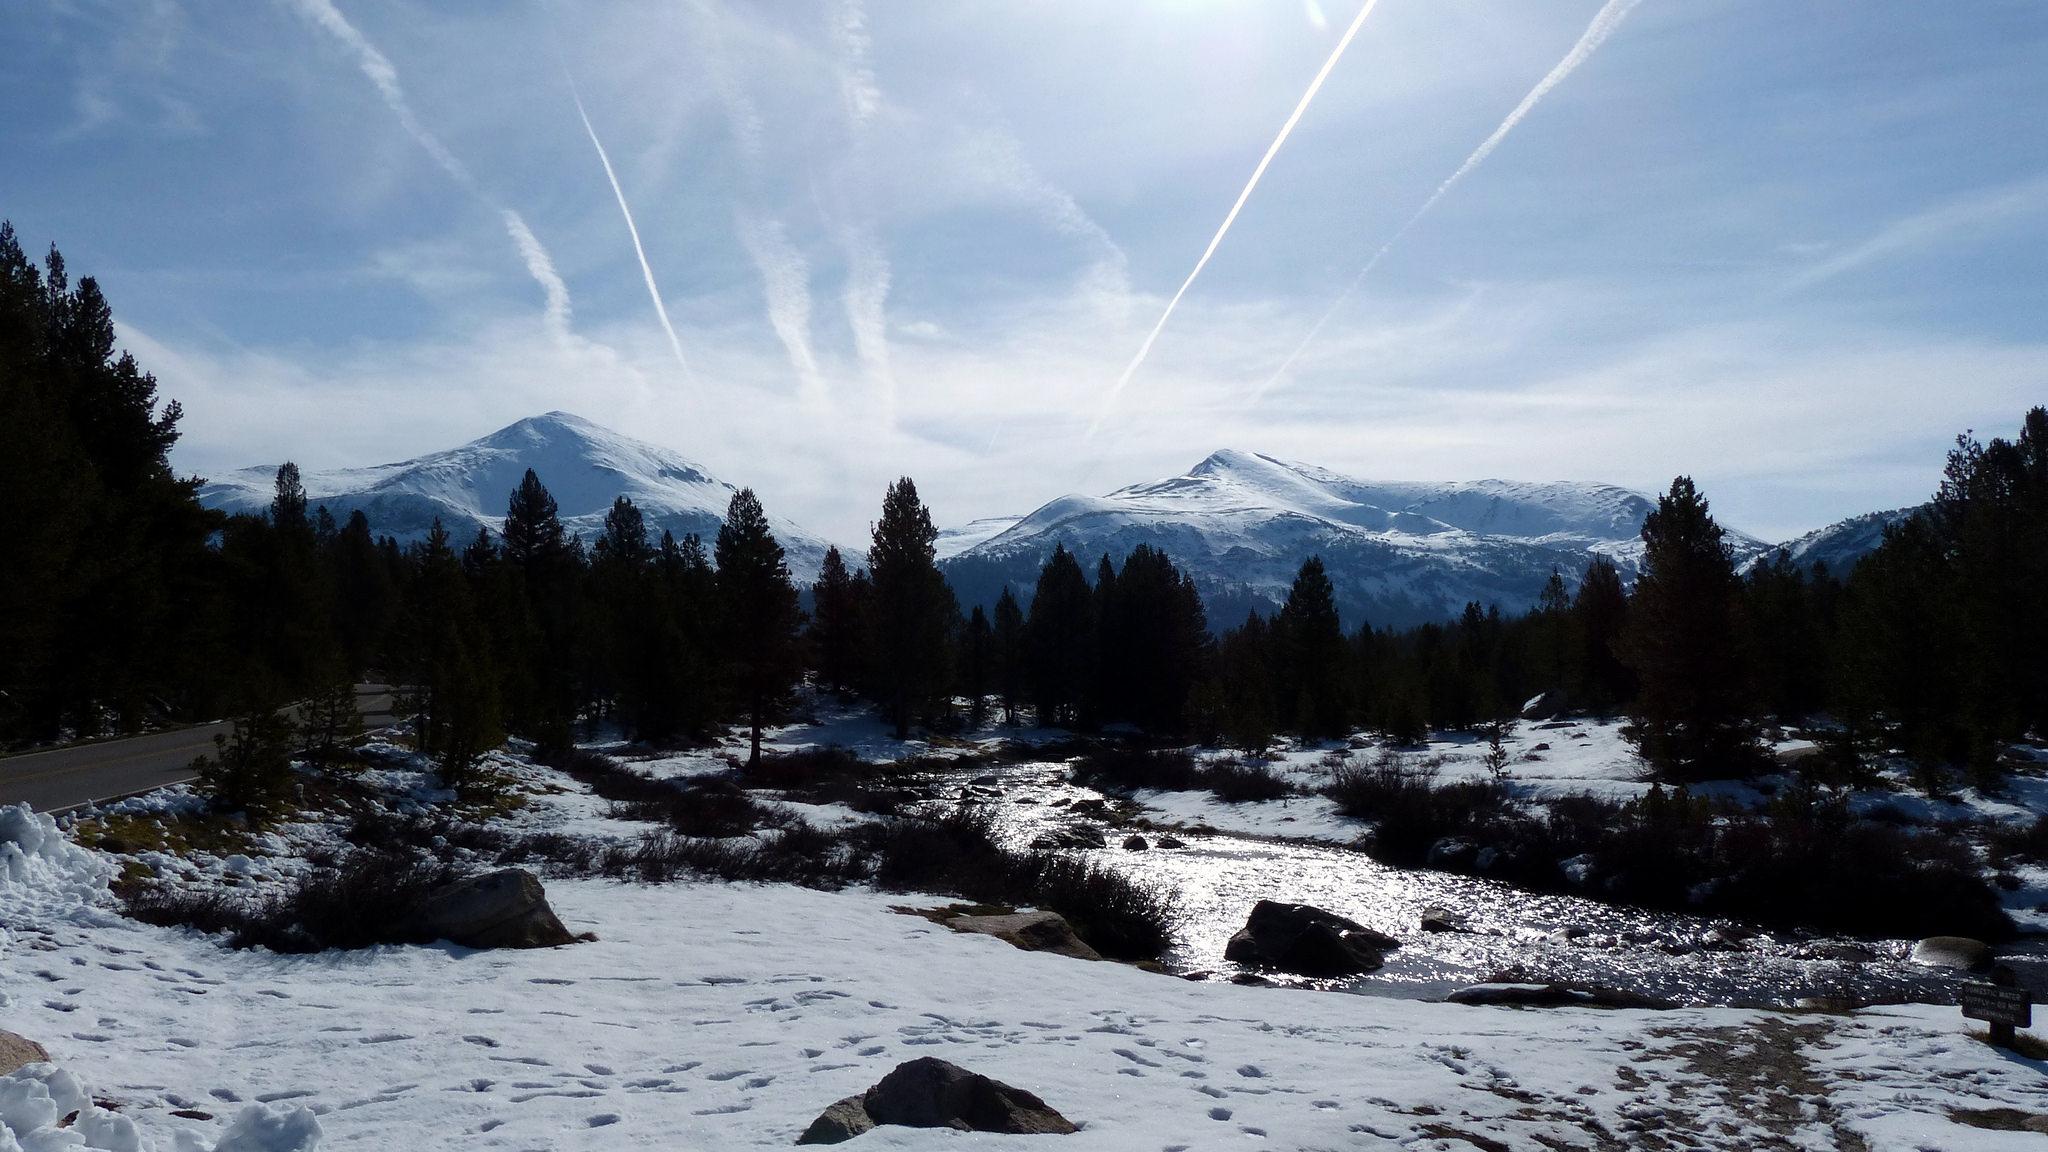 Sierra crest from Tioga Pass